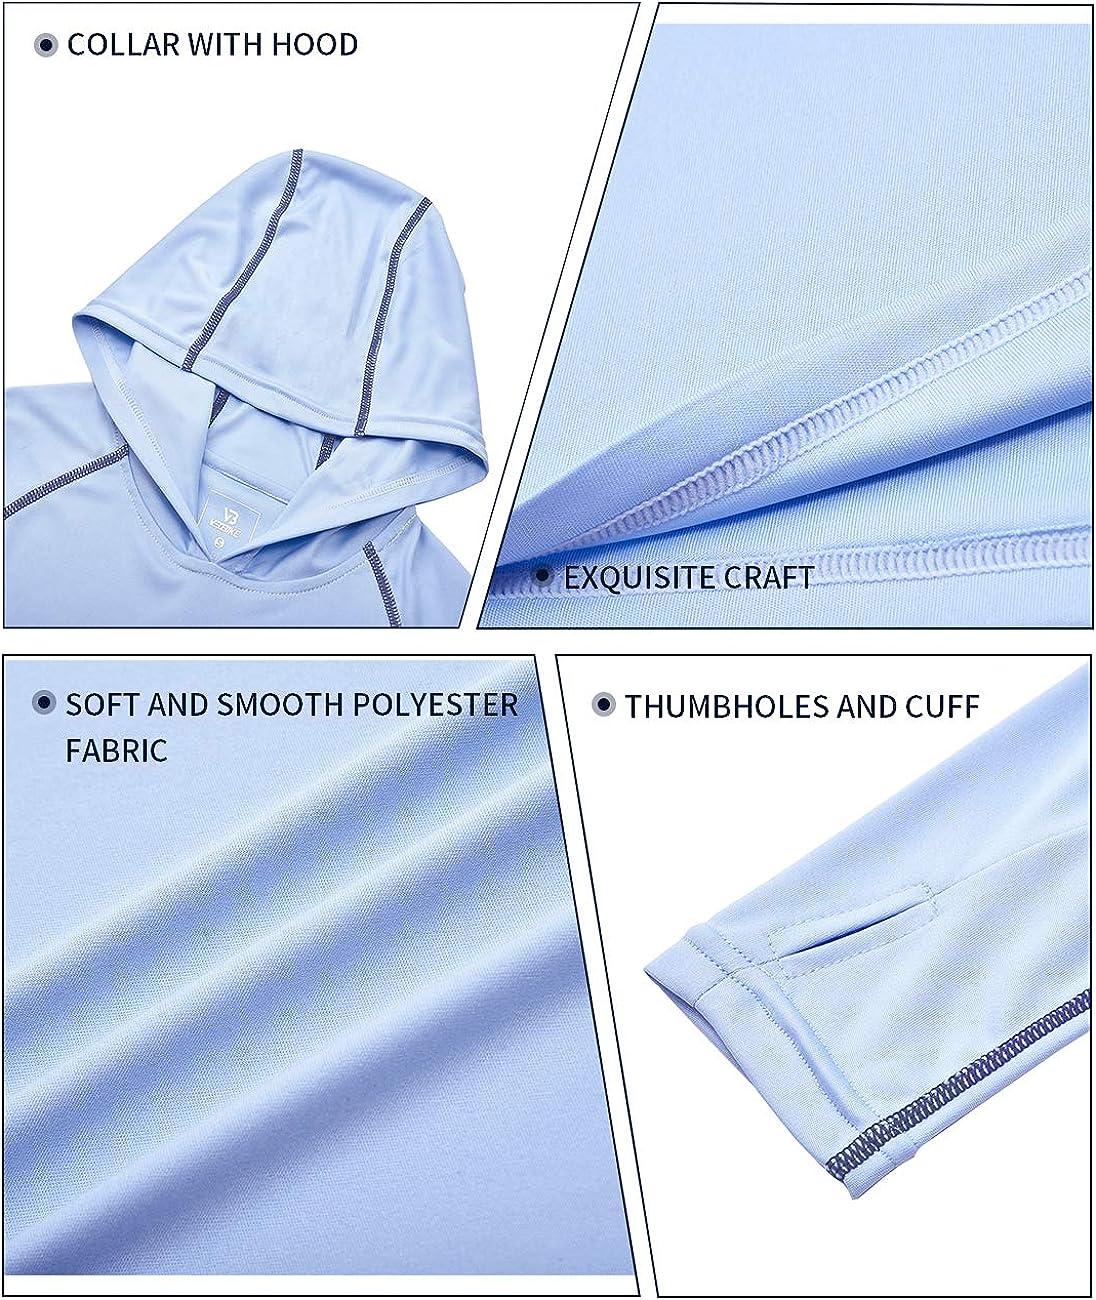 VEOBIKE Youth UPF50 Sun Shirts Rashguard Quick Dry Long Sleeve Hoodies T-Shirts for Workout Thumbholes